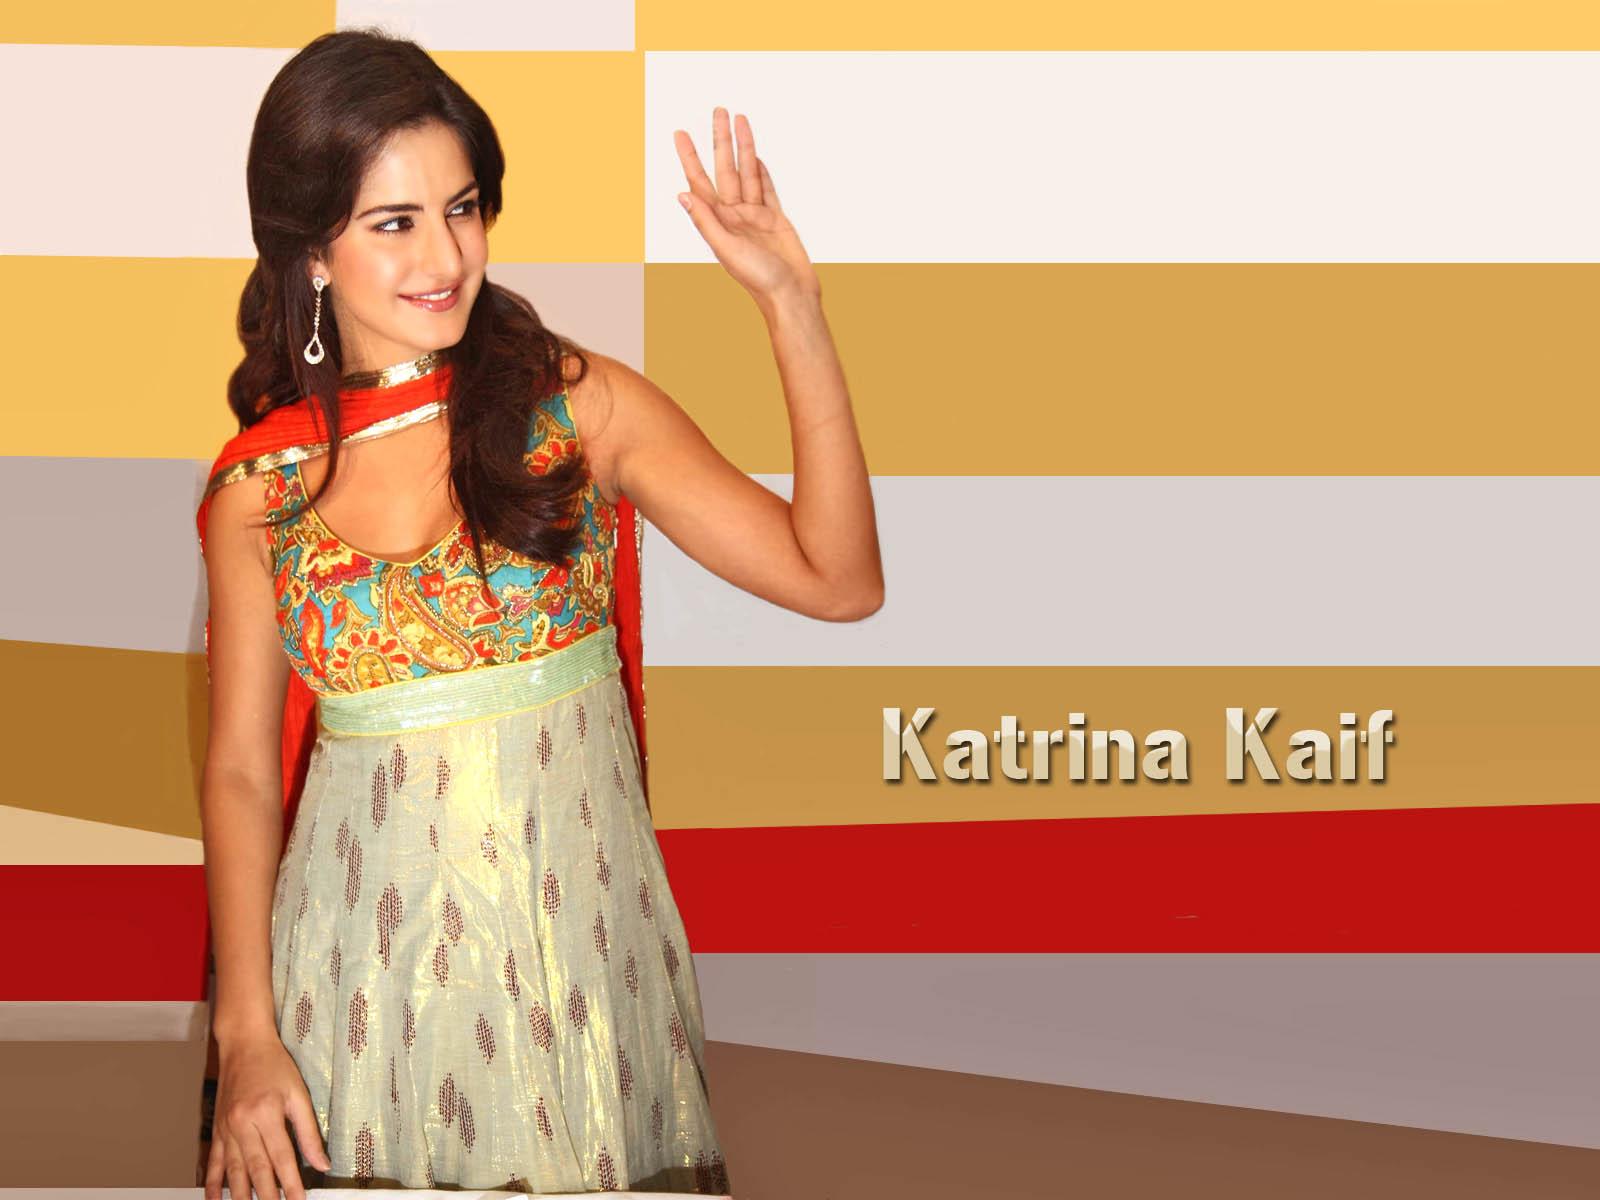 http://2.bp.blogspot.com/_Fbqc6JbQSVw/SgAbCacquAI/AAAAAAAAYBc/Awk1dVVPCWw/s1600/Katrina_Kaif_a_122.jpg